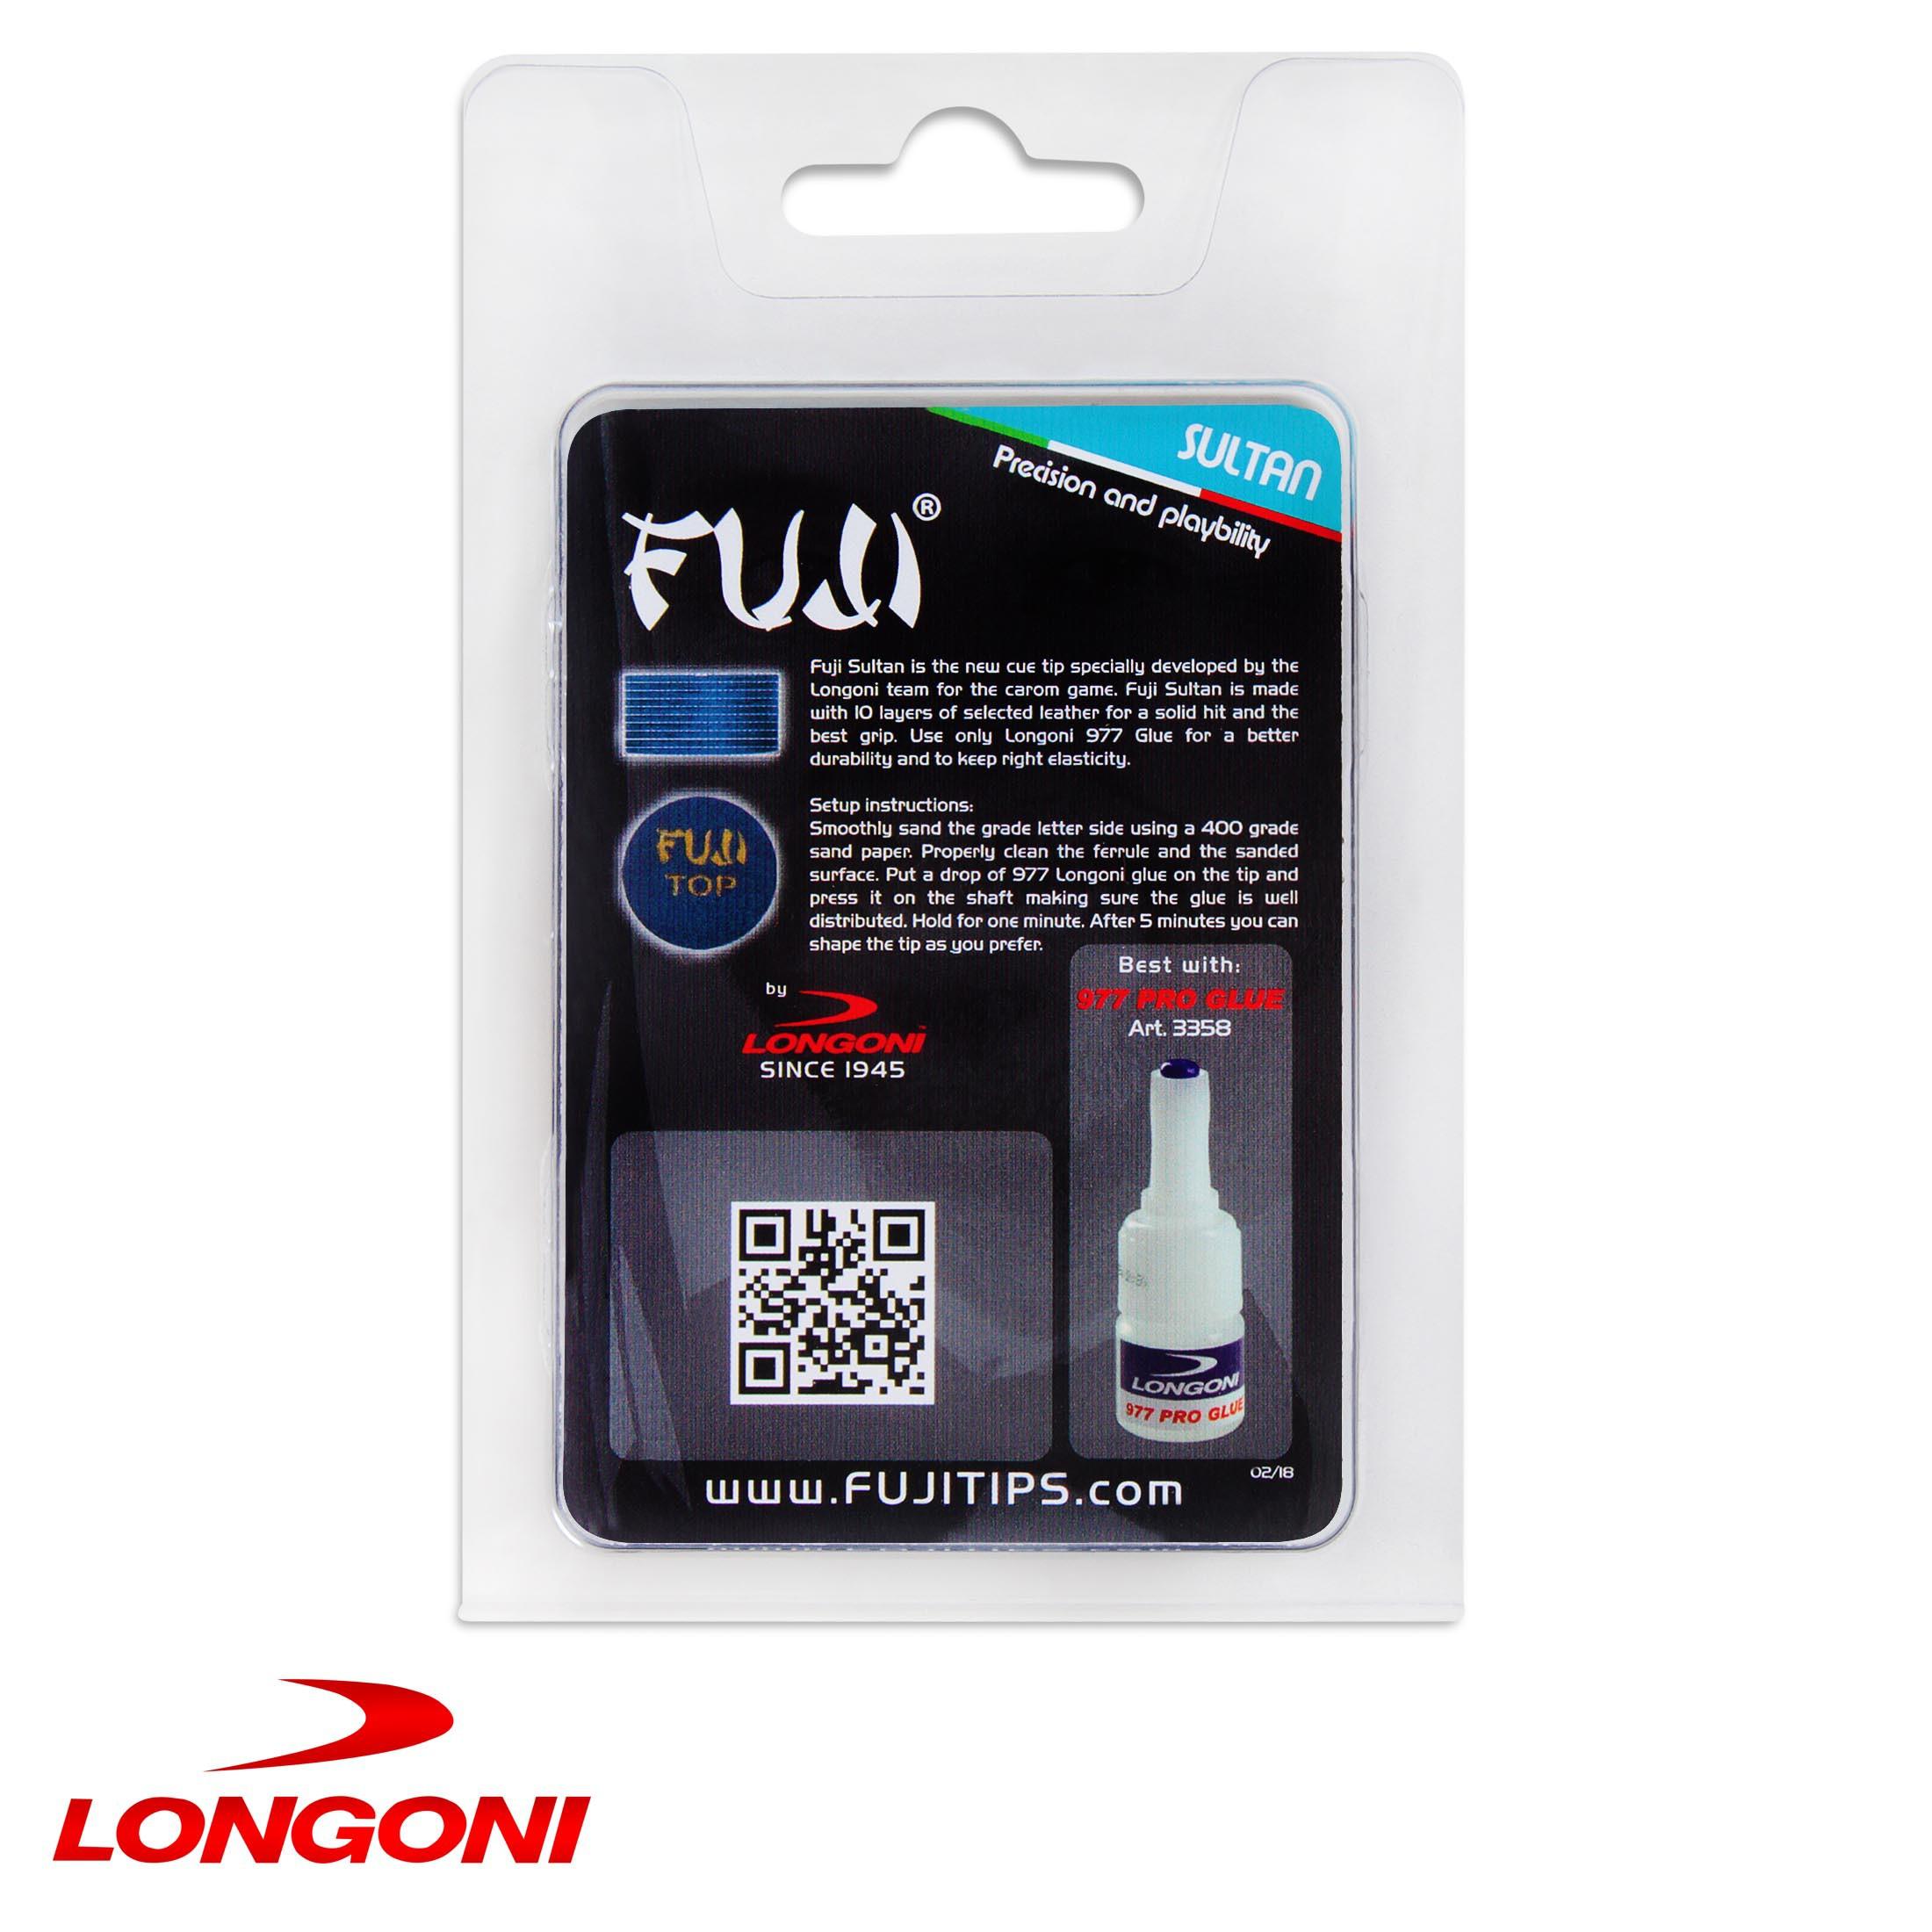 Наклейка для кия Longoni Fuji Sultan ø14мм Hard 1шт.